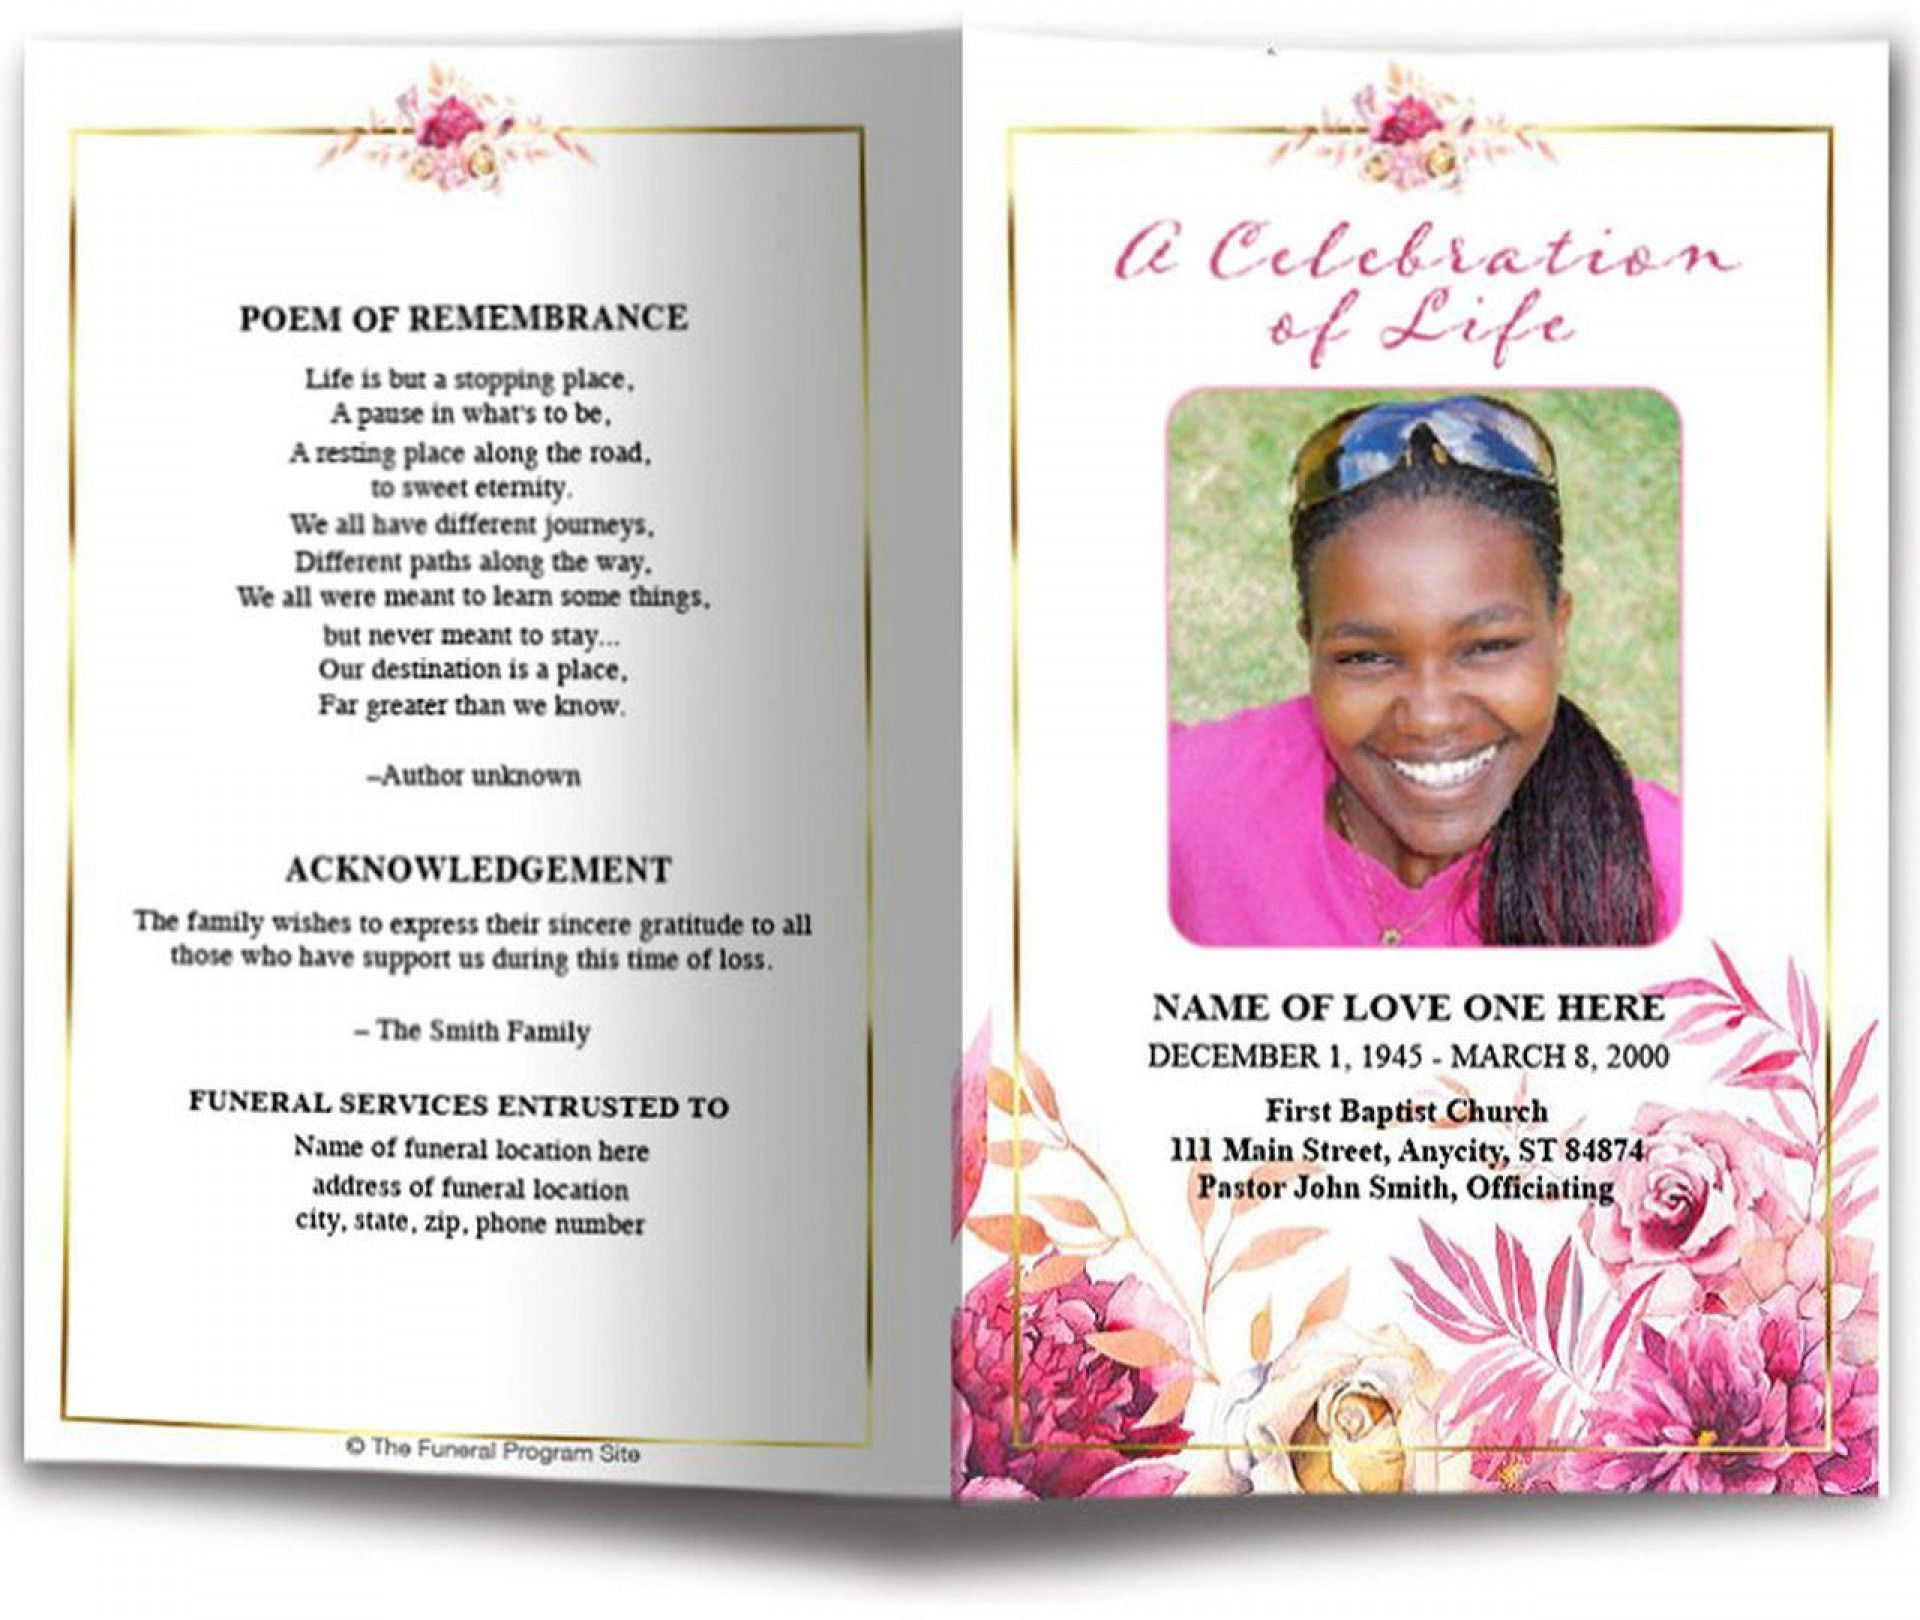 000 Breathtaking Funeral Program Template Free Photo  Online Printable Download PublisherFull